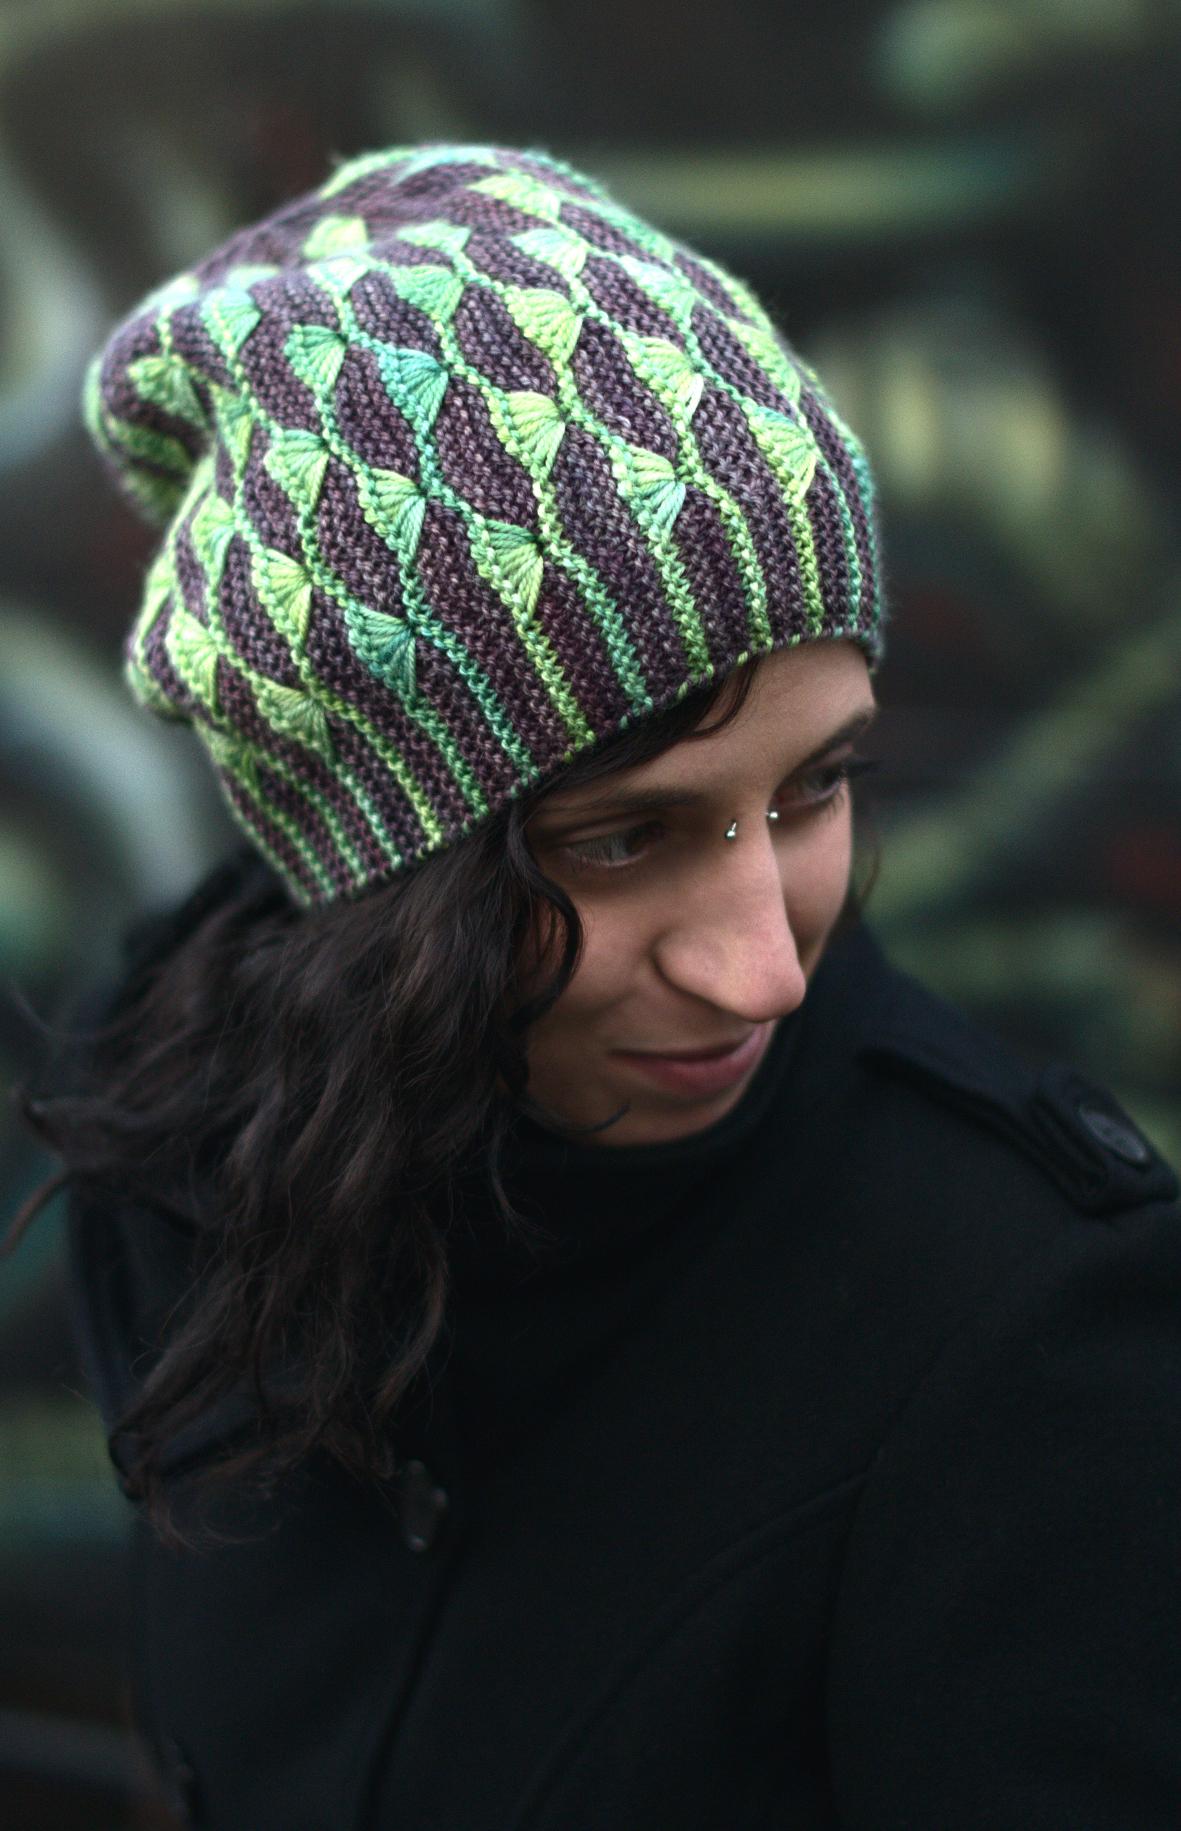 Diponaea sideways knit dip stitch colourwork Hat hand knitting pattern for DK yarn